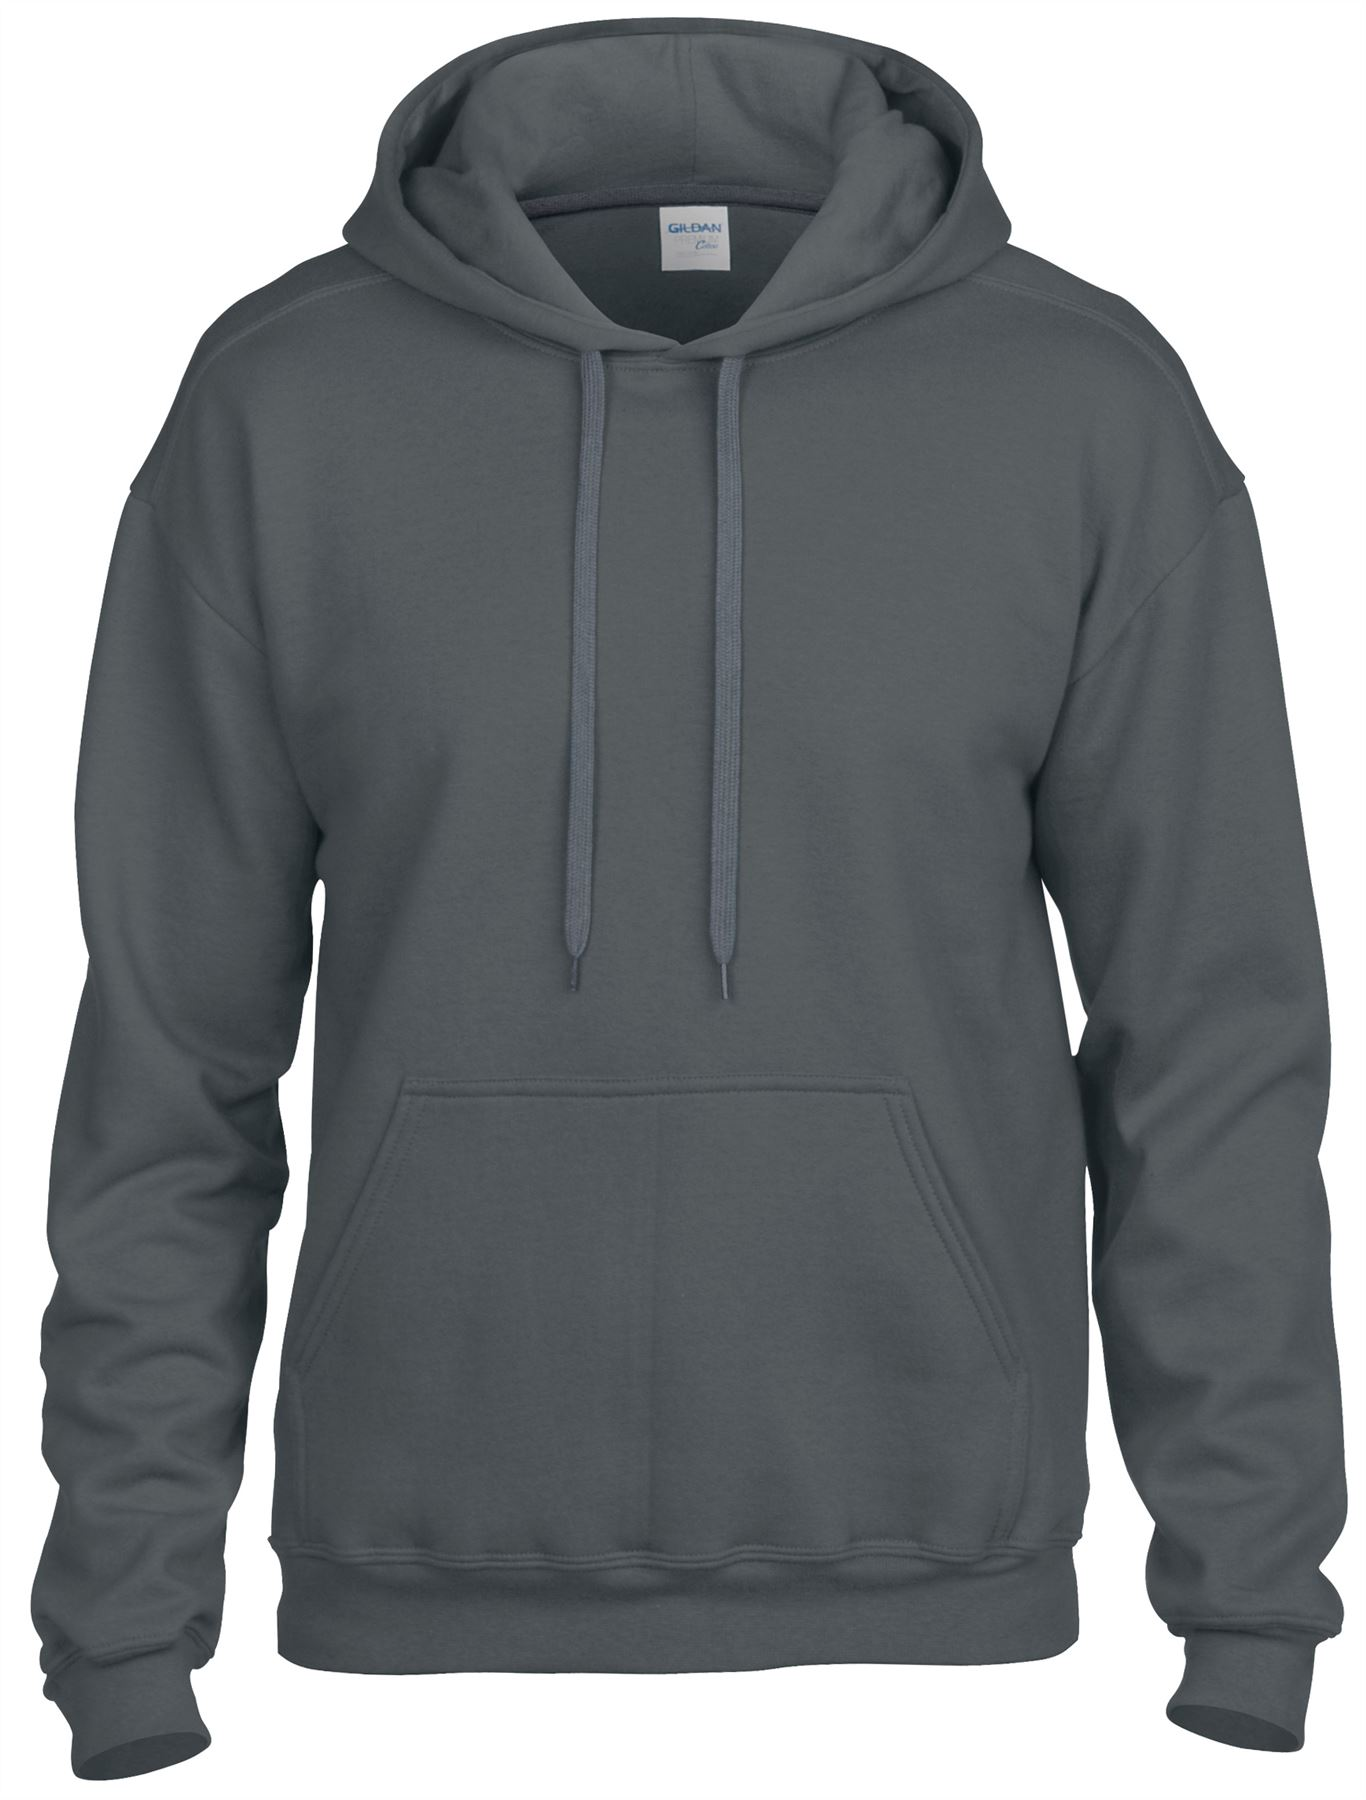 Gildan-Mens Sweatshirts & Hoodies-Premium cotton hooded ...